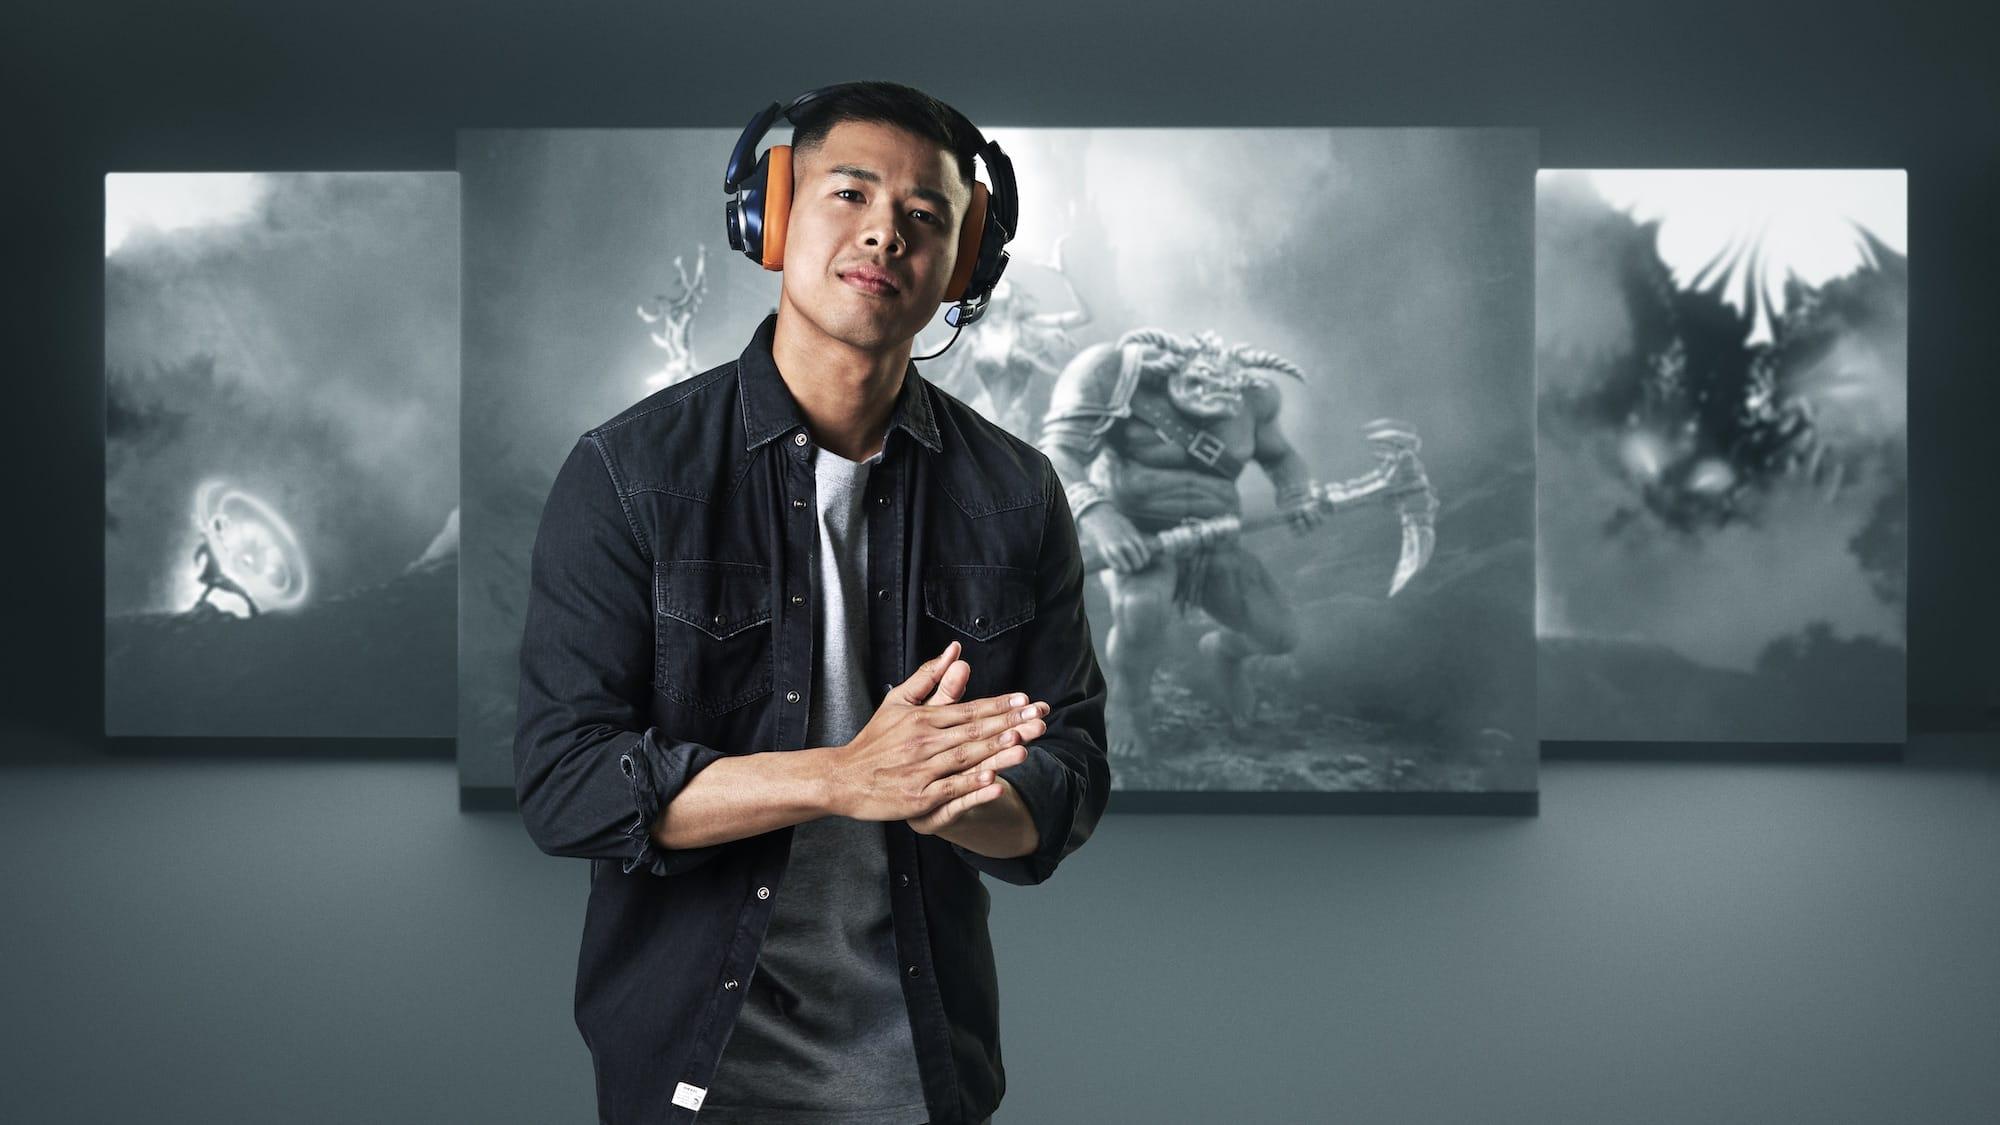 EPOS GSP 600 series premium gaming headsets have aesthetics, quality materials, & comfort